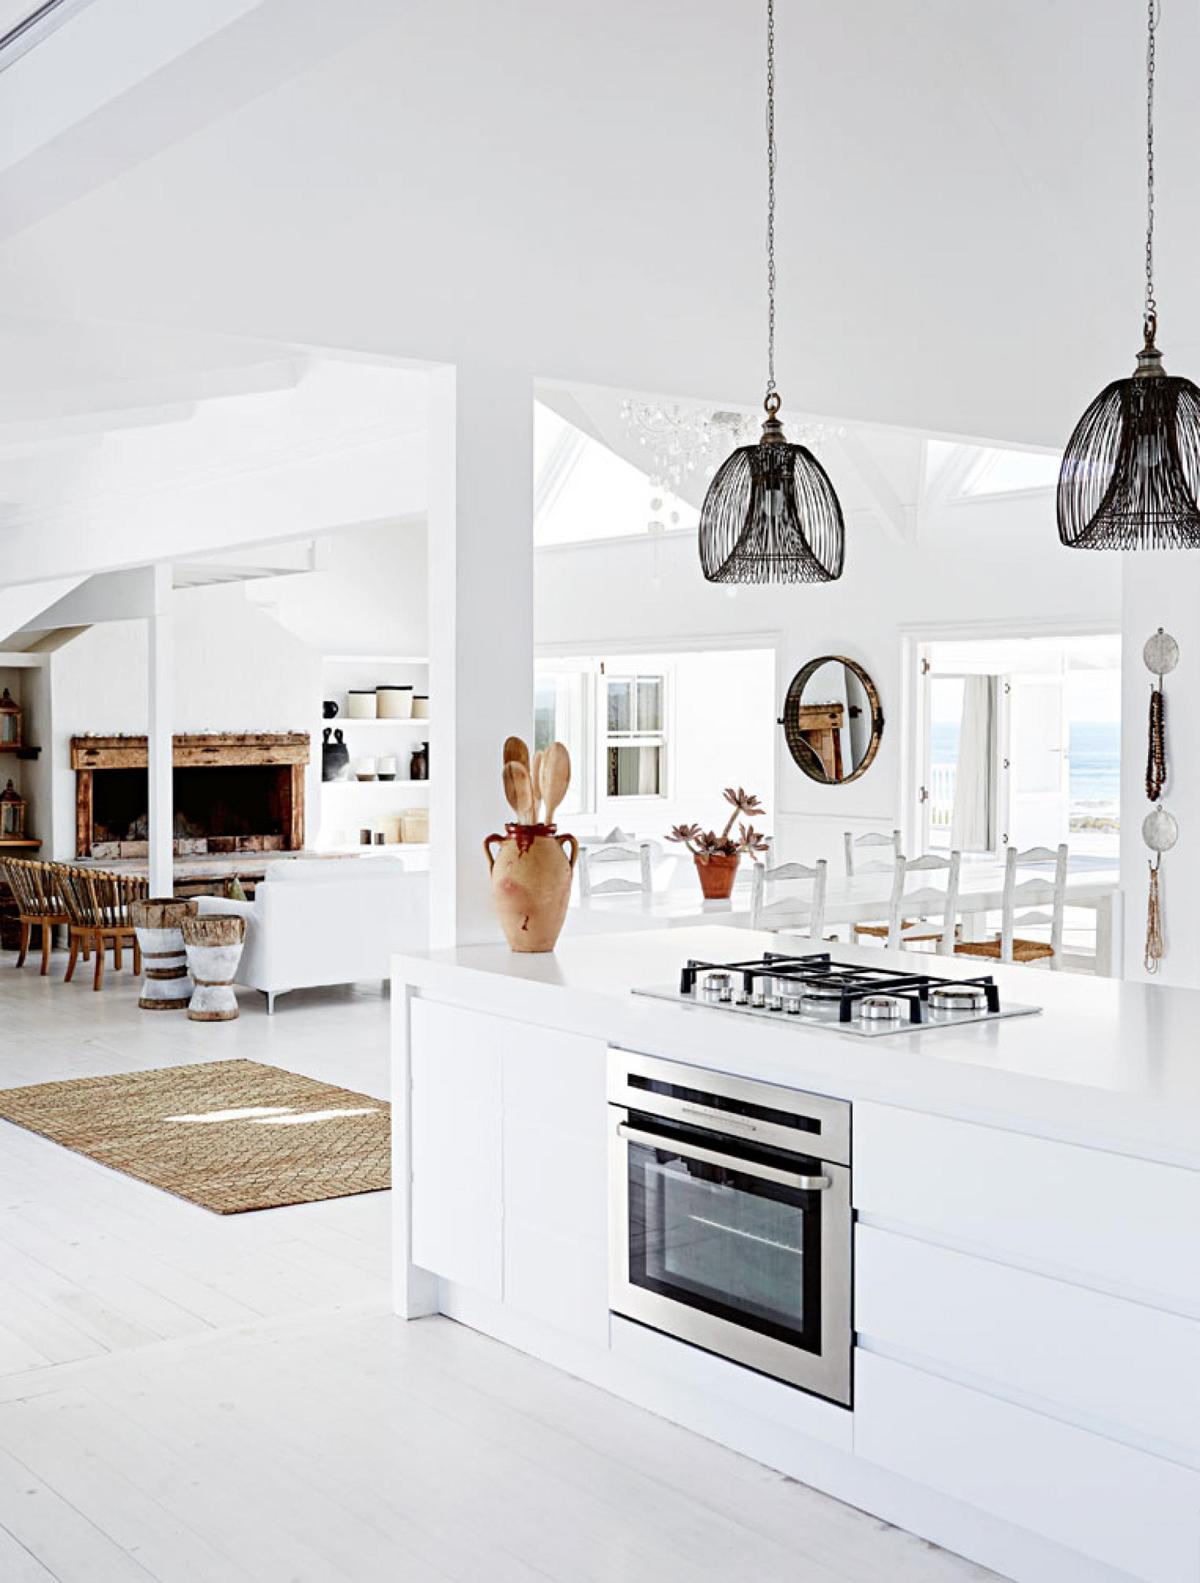 Home Tour An All White Beach House The Home Studio Interior Designers